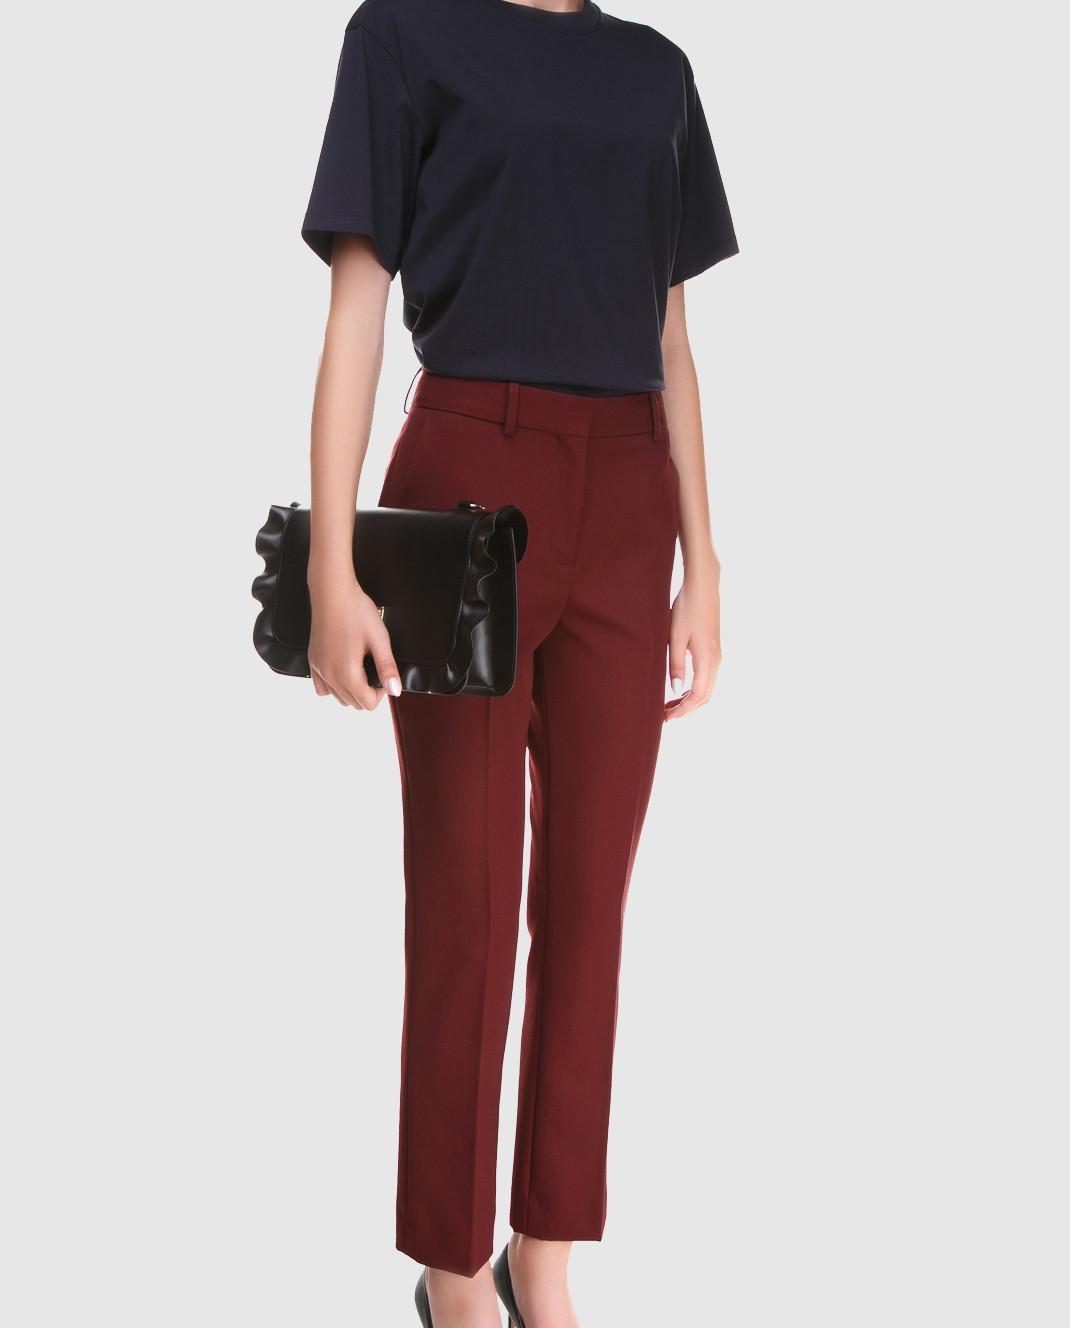 Victoria by Victoria Beckham Бордовые брюки из шерсти TRVV085B изображение 2